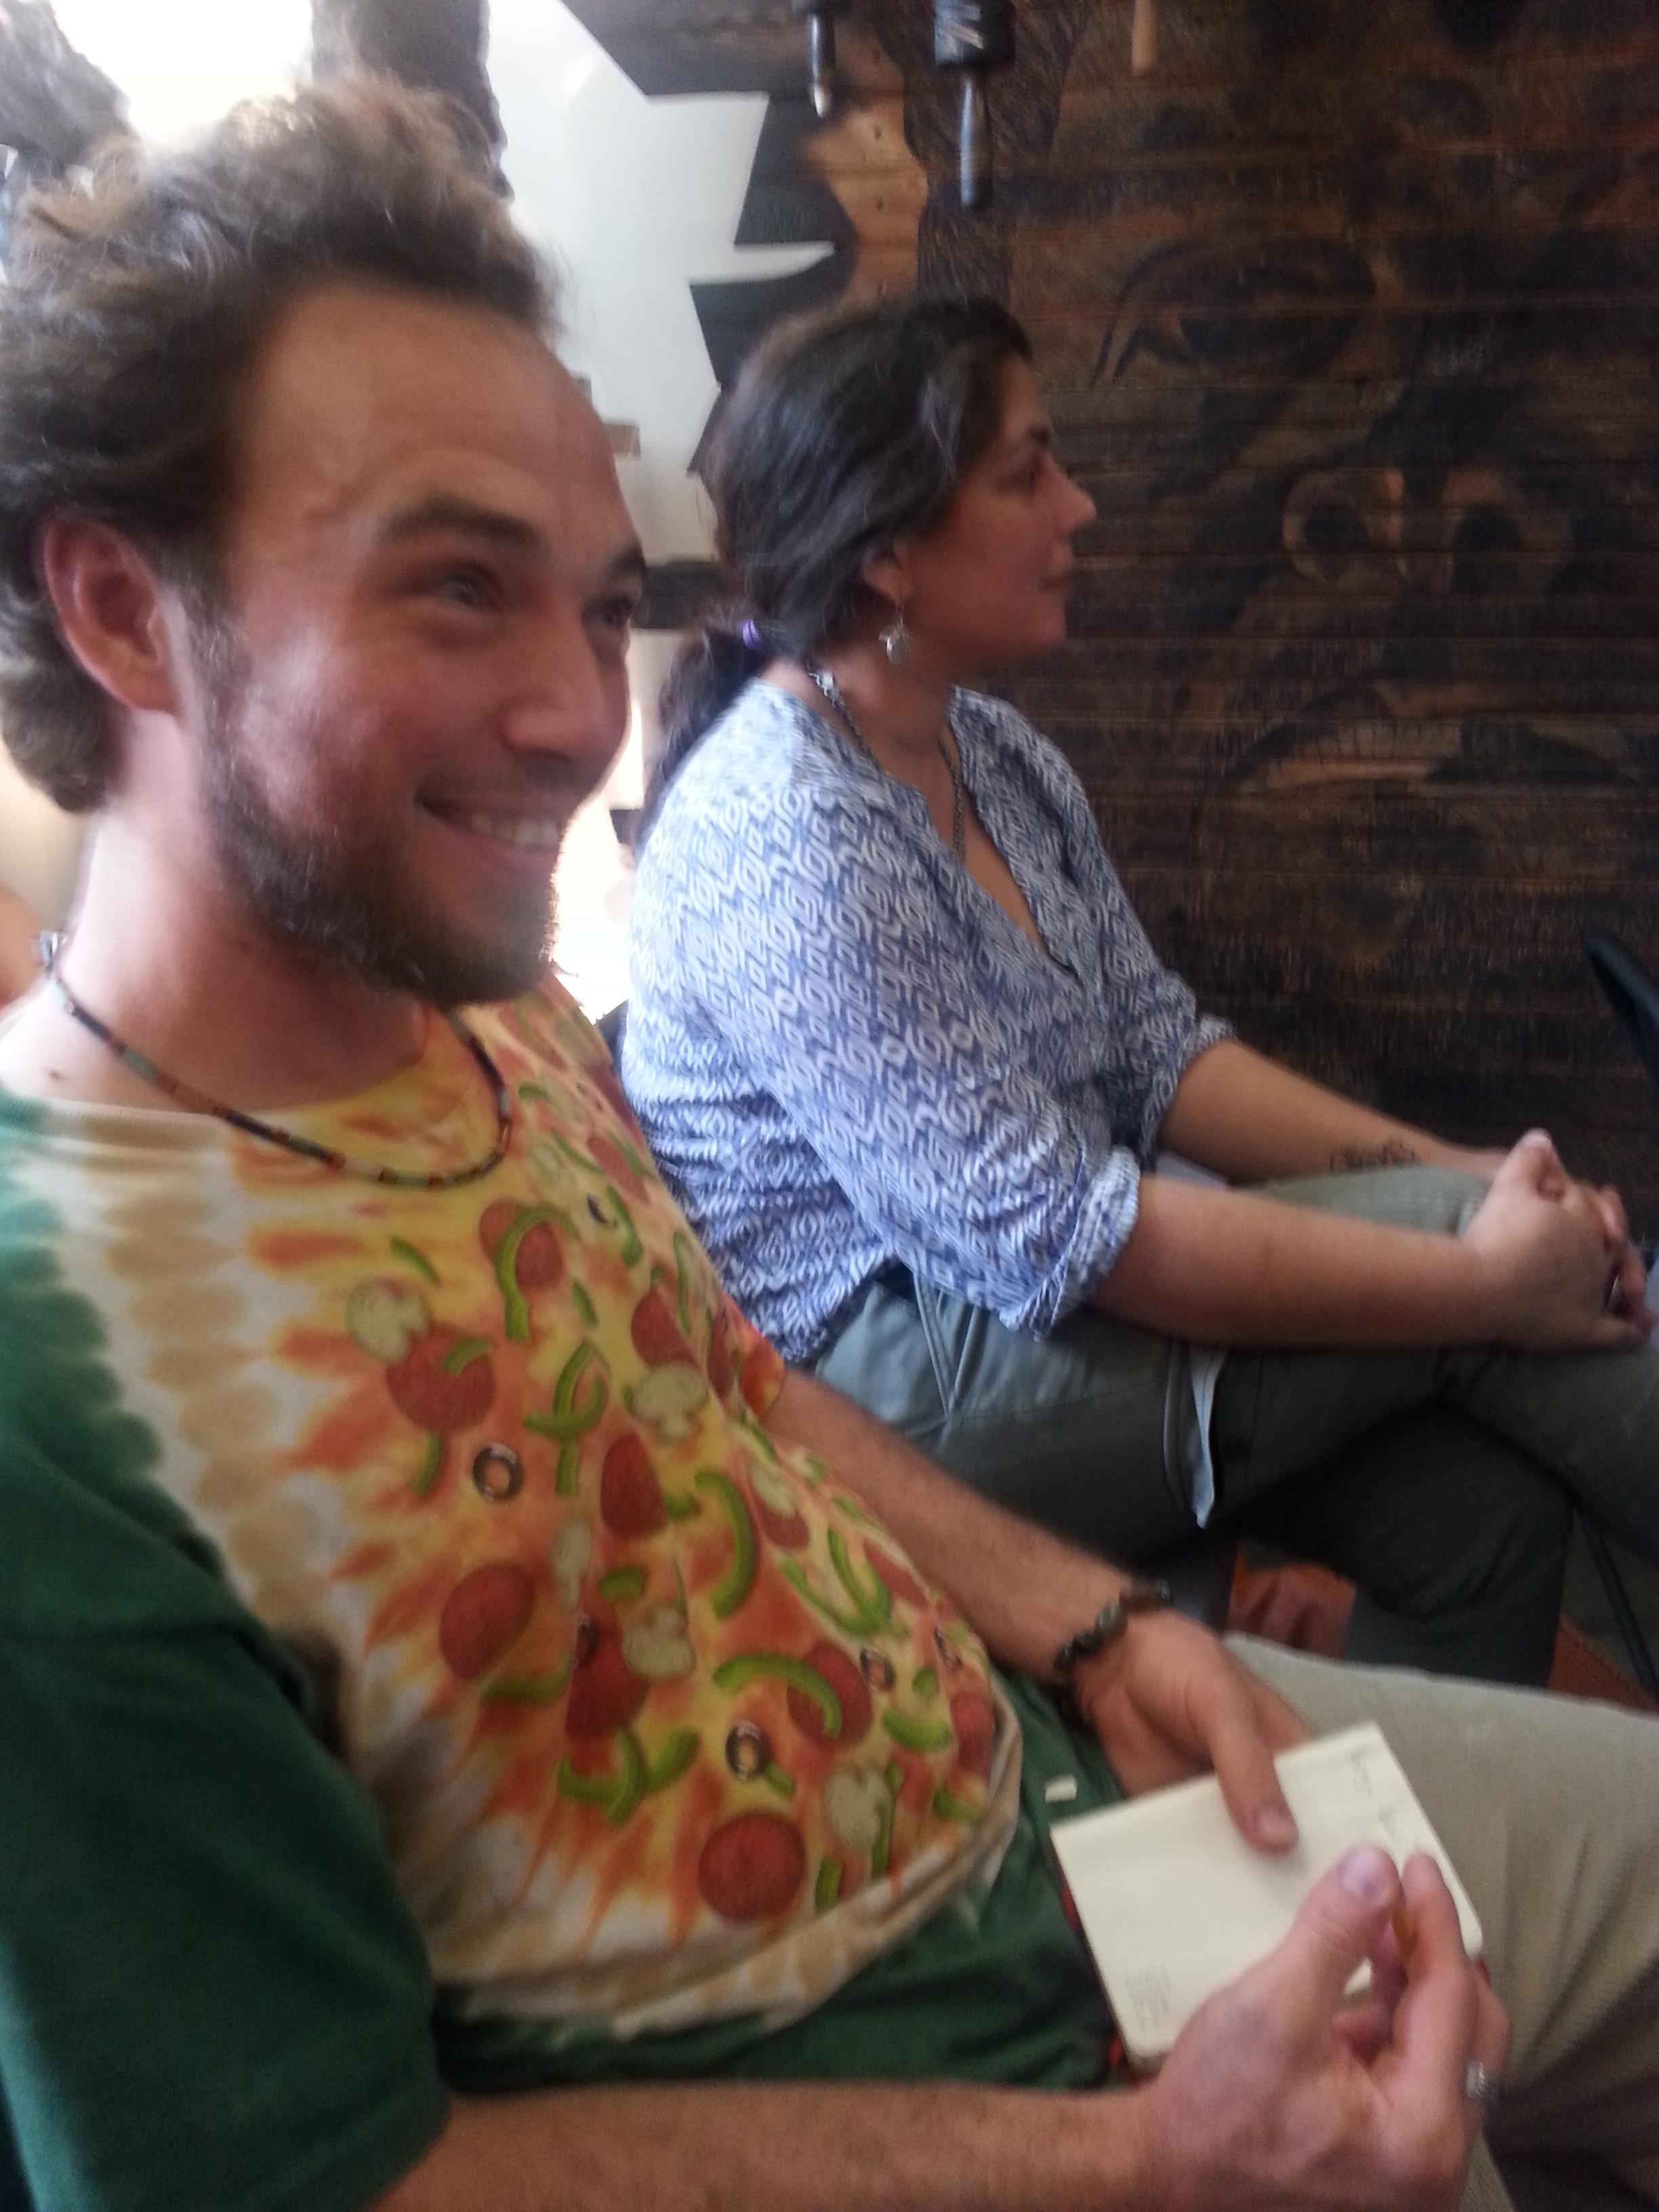 Sashi and Bret enjoying the company and poems